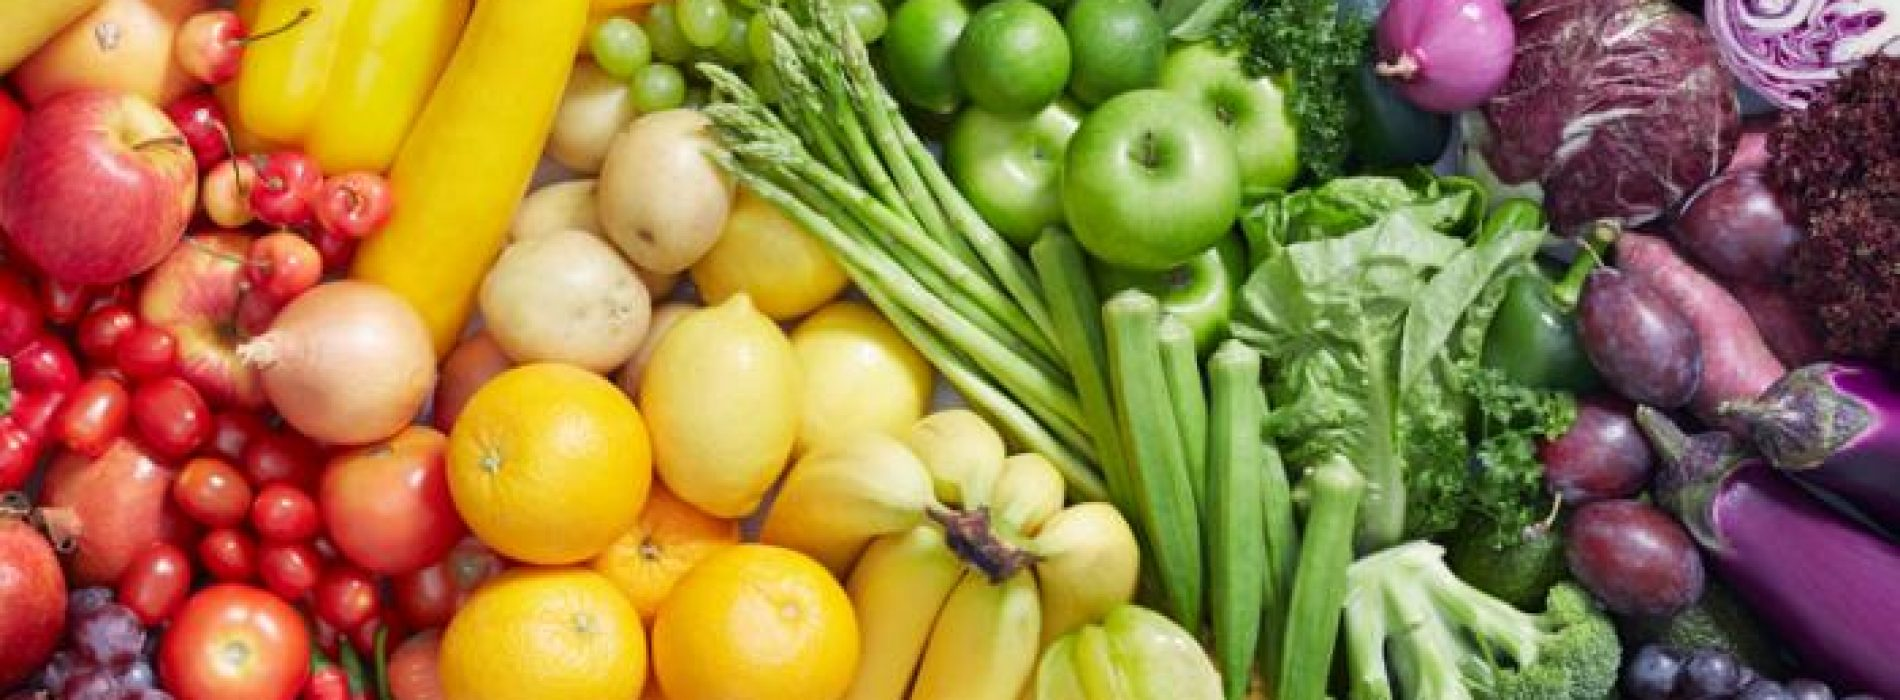 Ontstekingsremmende voedingsmiddelen die borstkanker voorkomen